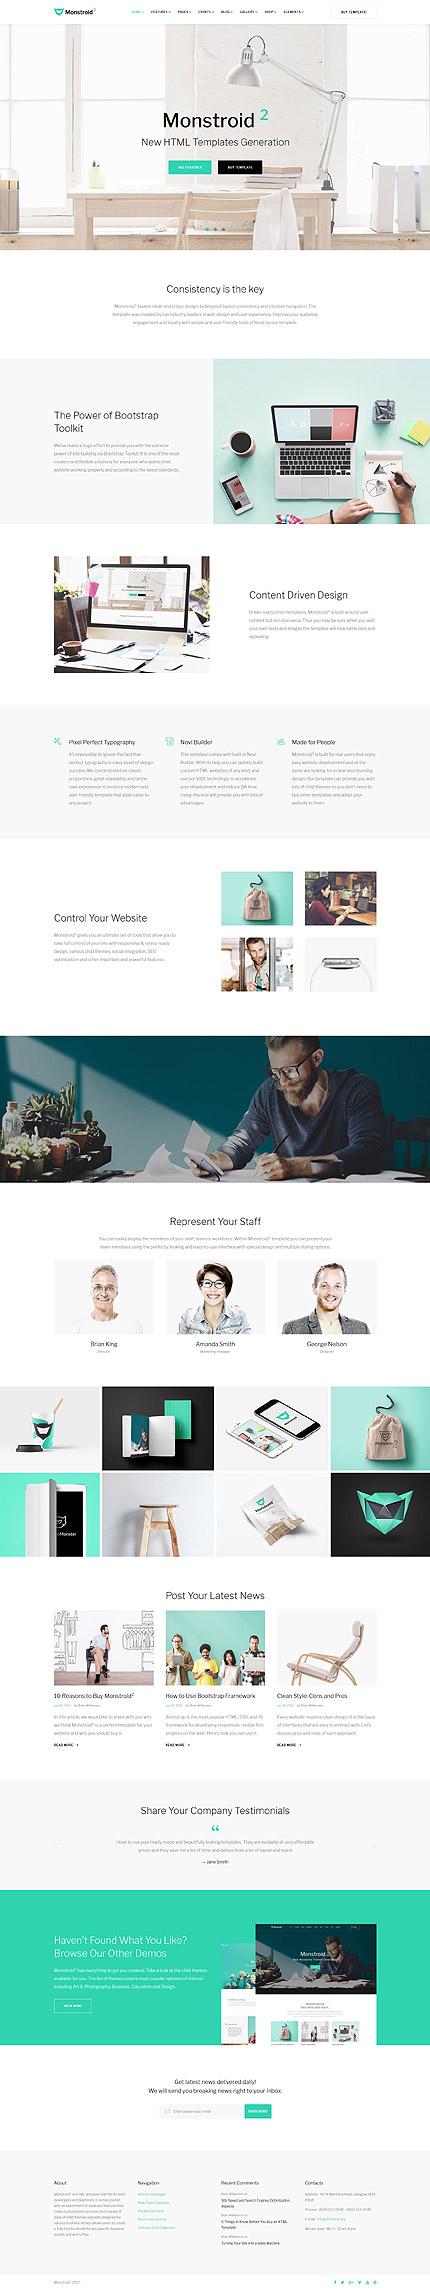 Website Templates | Free Website Templates | Free Web Templates